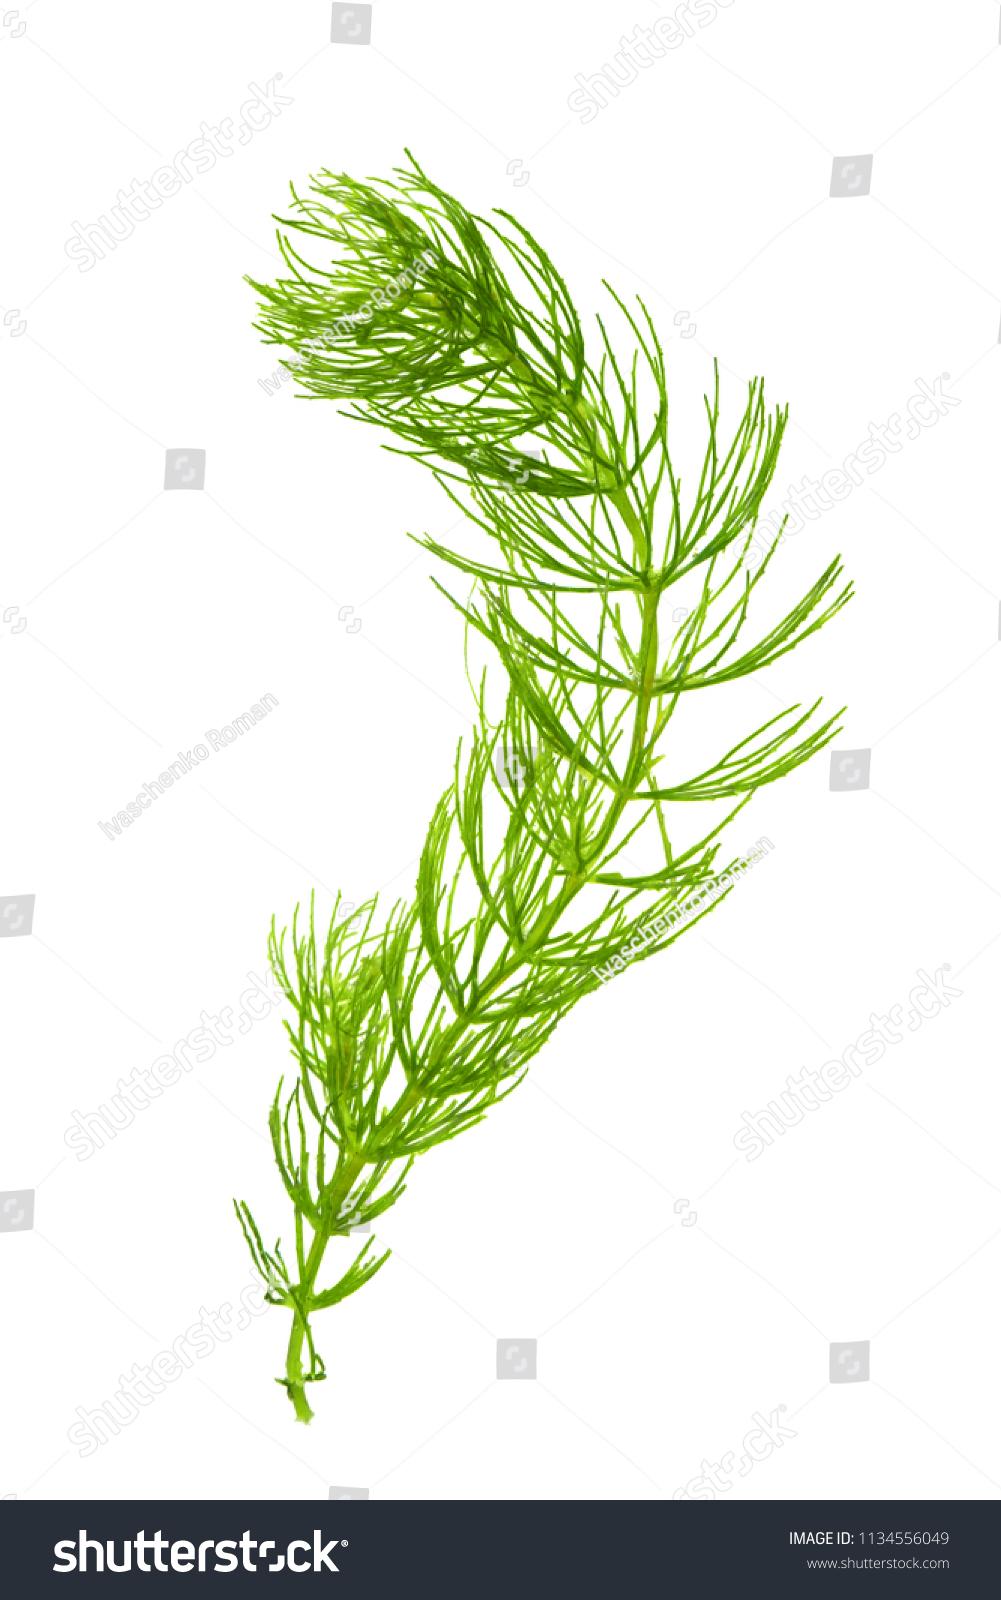 Hornwort Ceratophyllum Demersum On White Background Stock Photo.